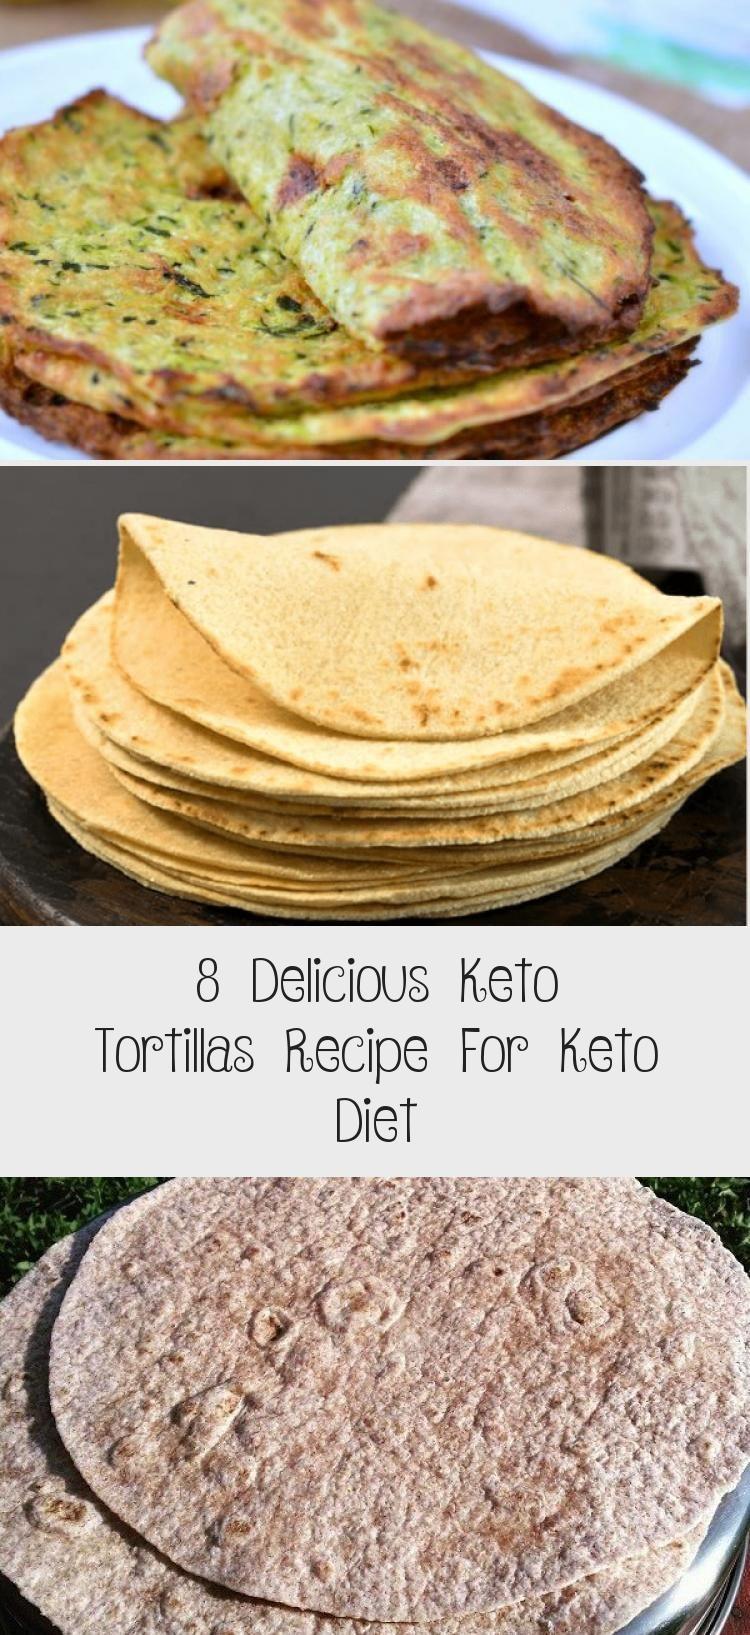 8 Delicious Keto Tortillas Recipe For Keto Diet Diet In 2020 Tortilla Recipe Recipes Quick Keto Meals